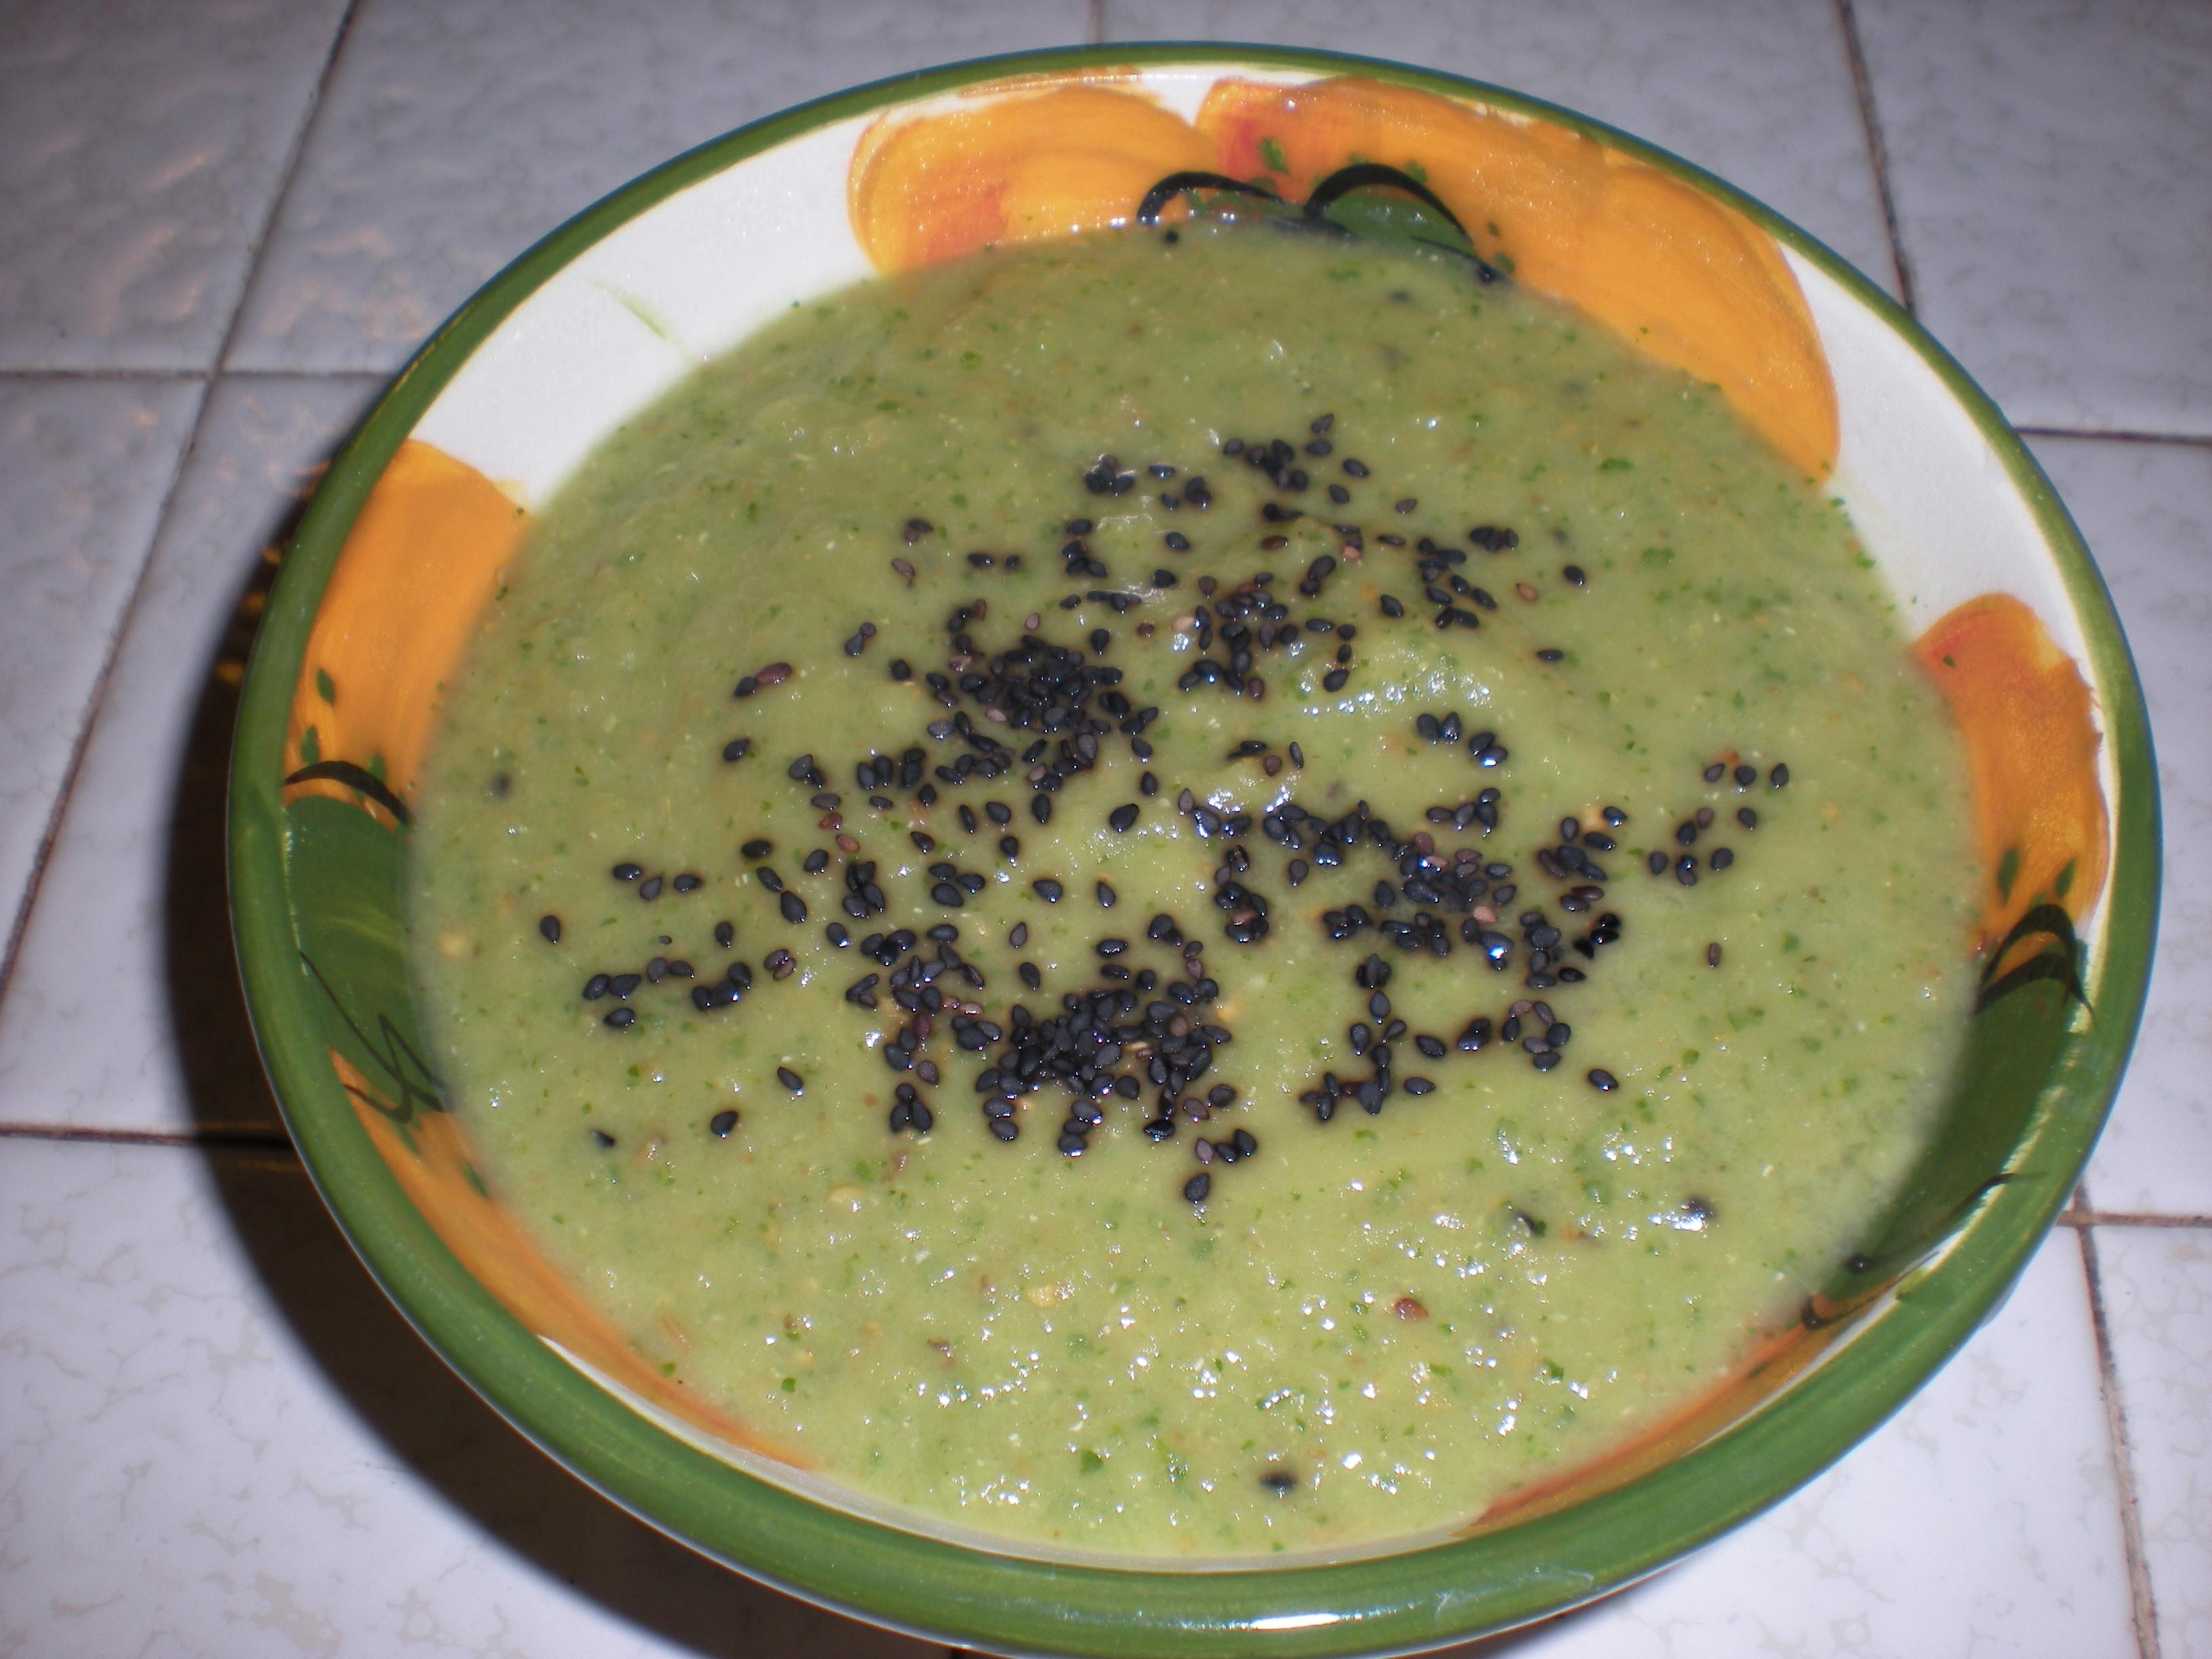 Creamy Baba Ganouj soup